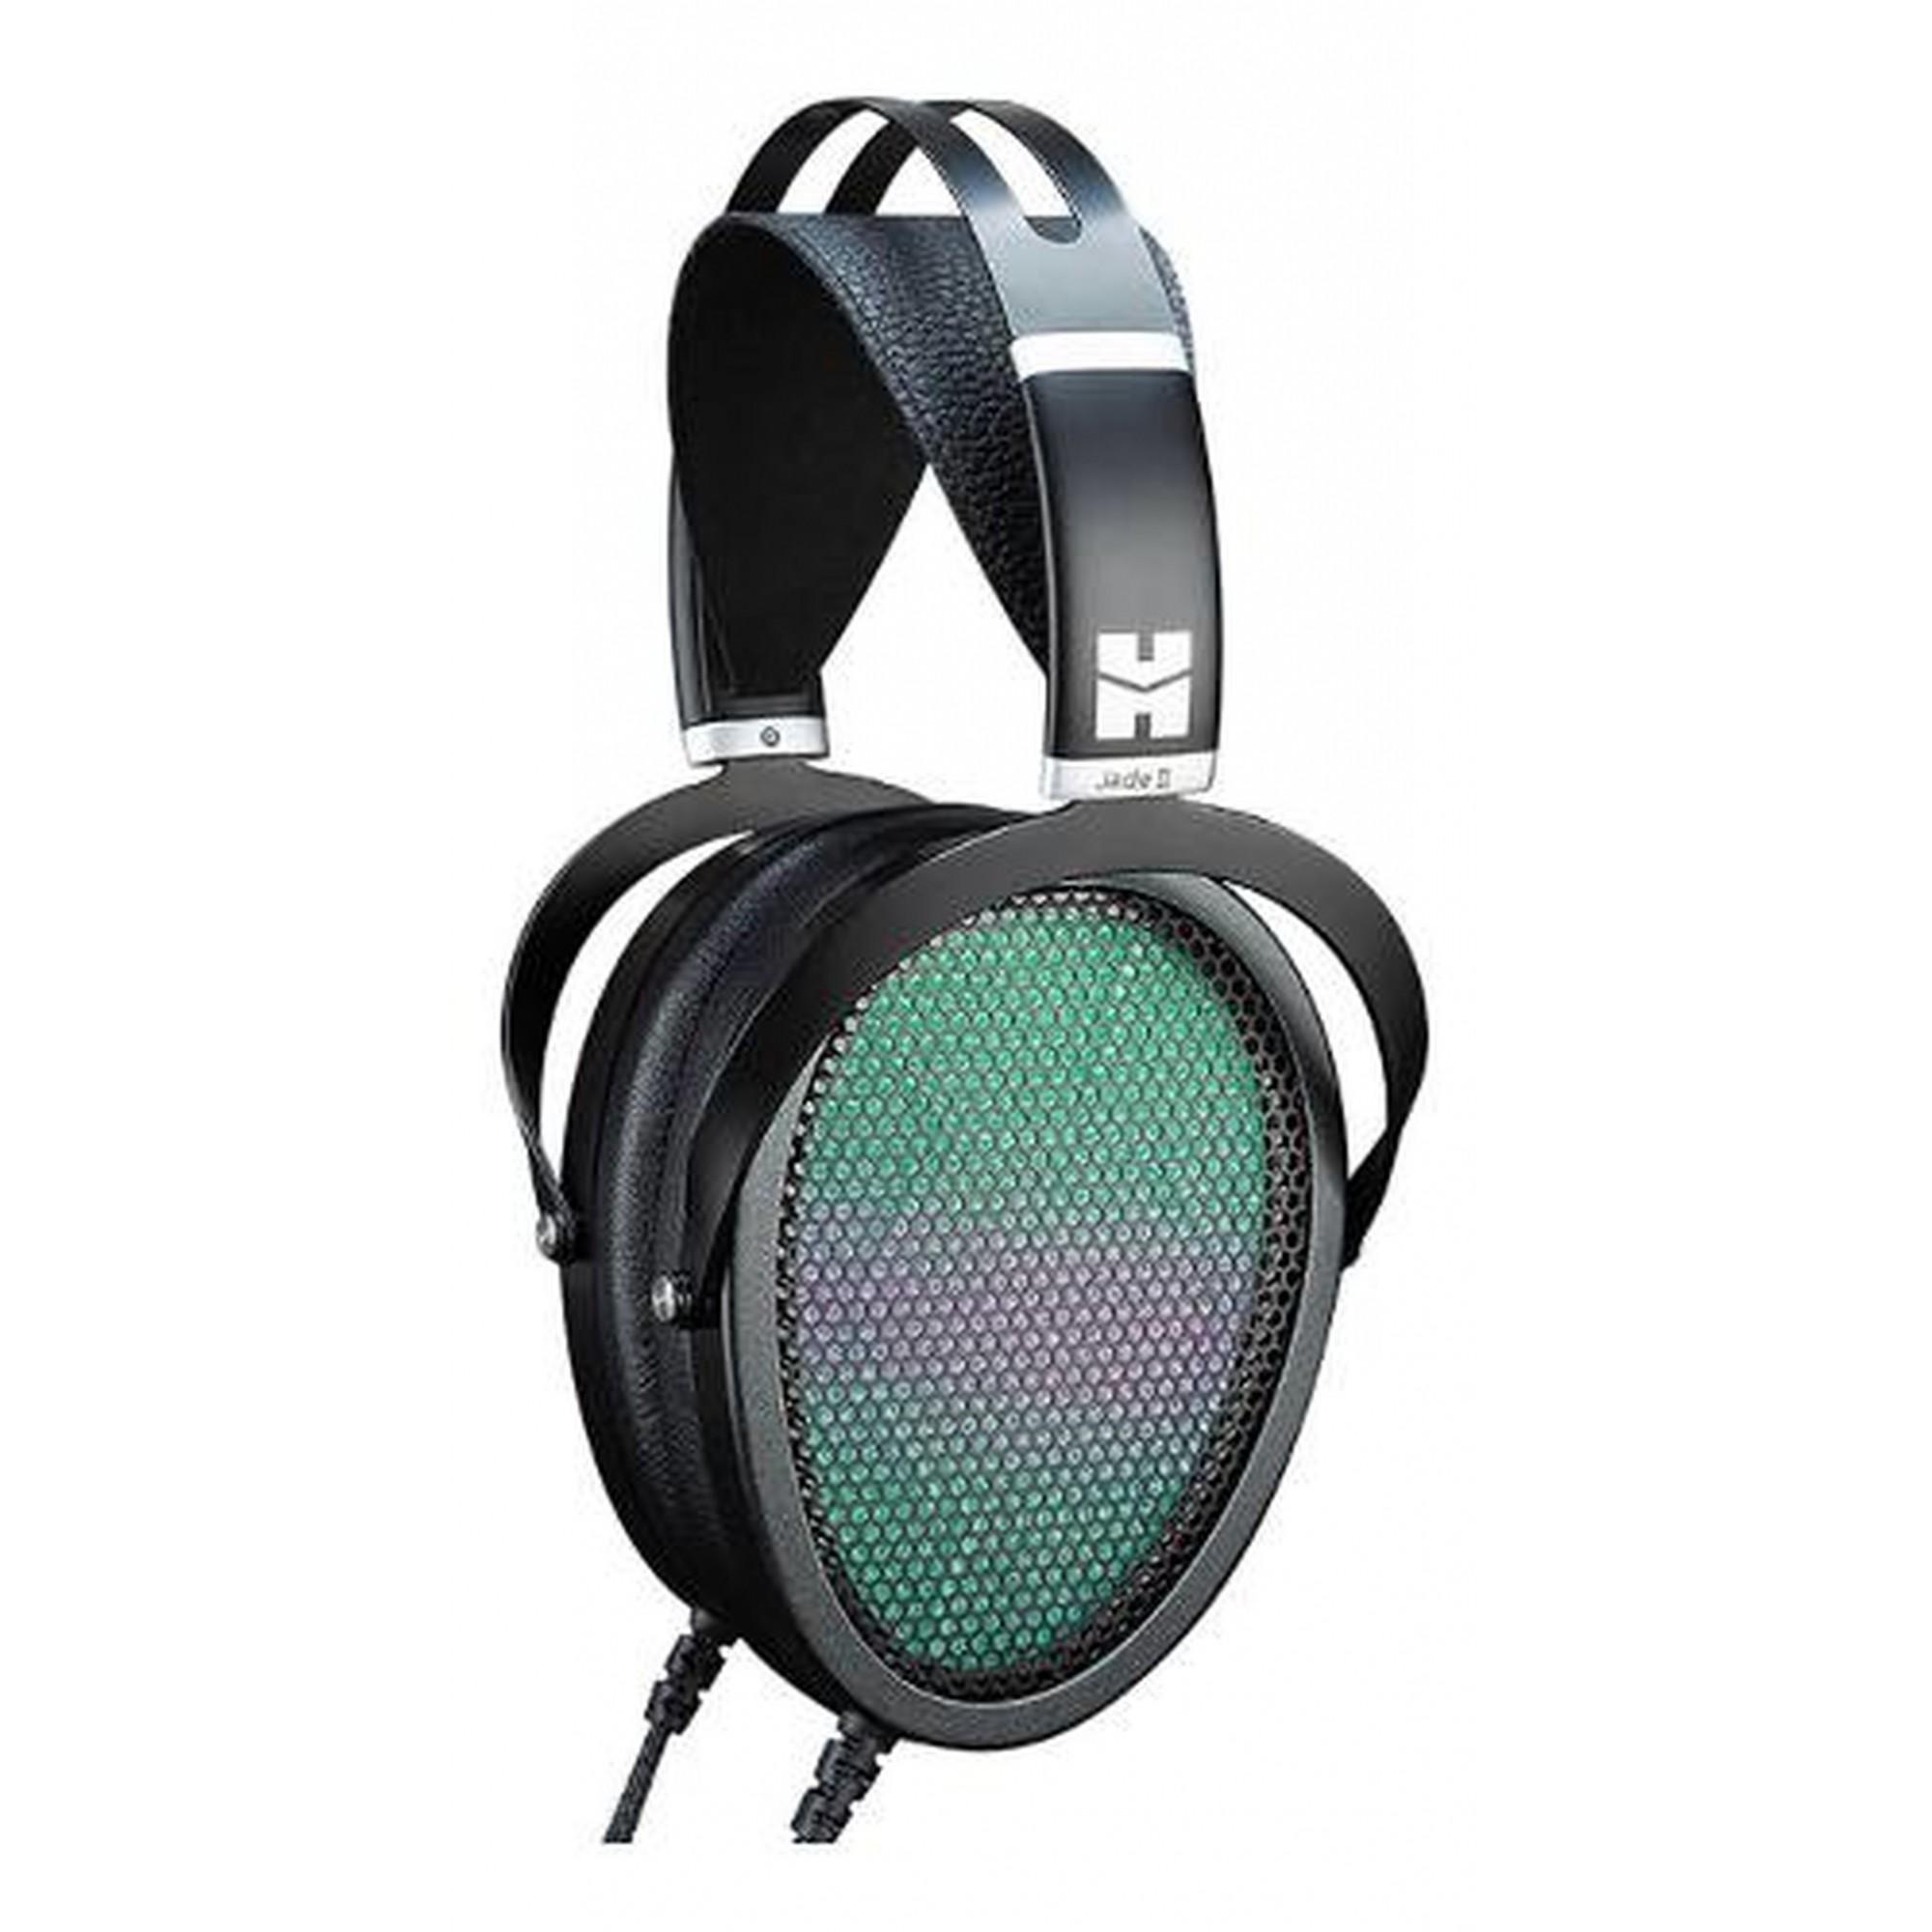 Hifiman Jade II Open-back Electrostatic Headphones